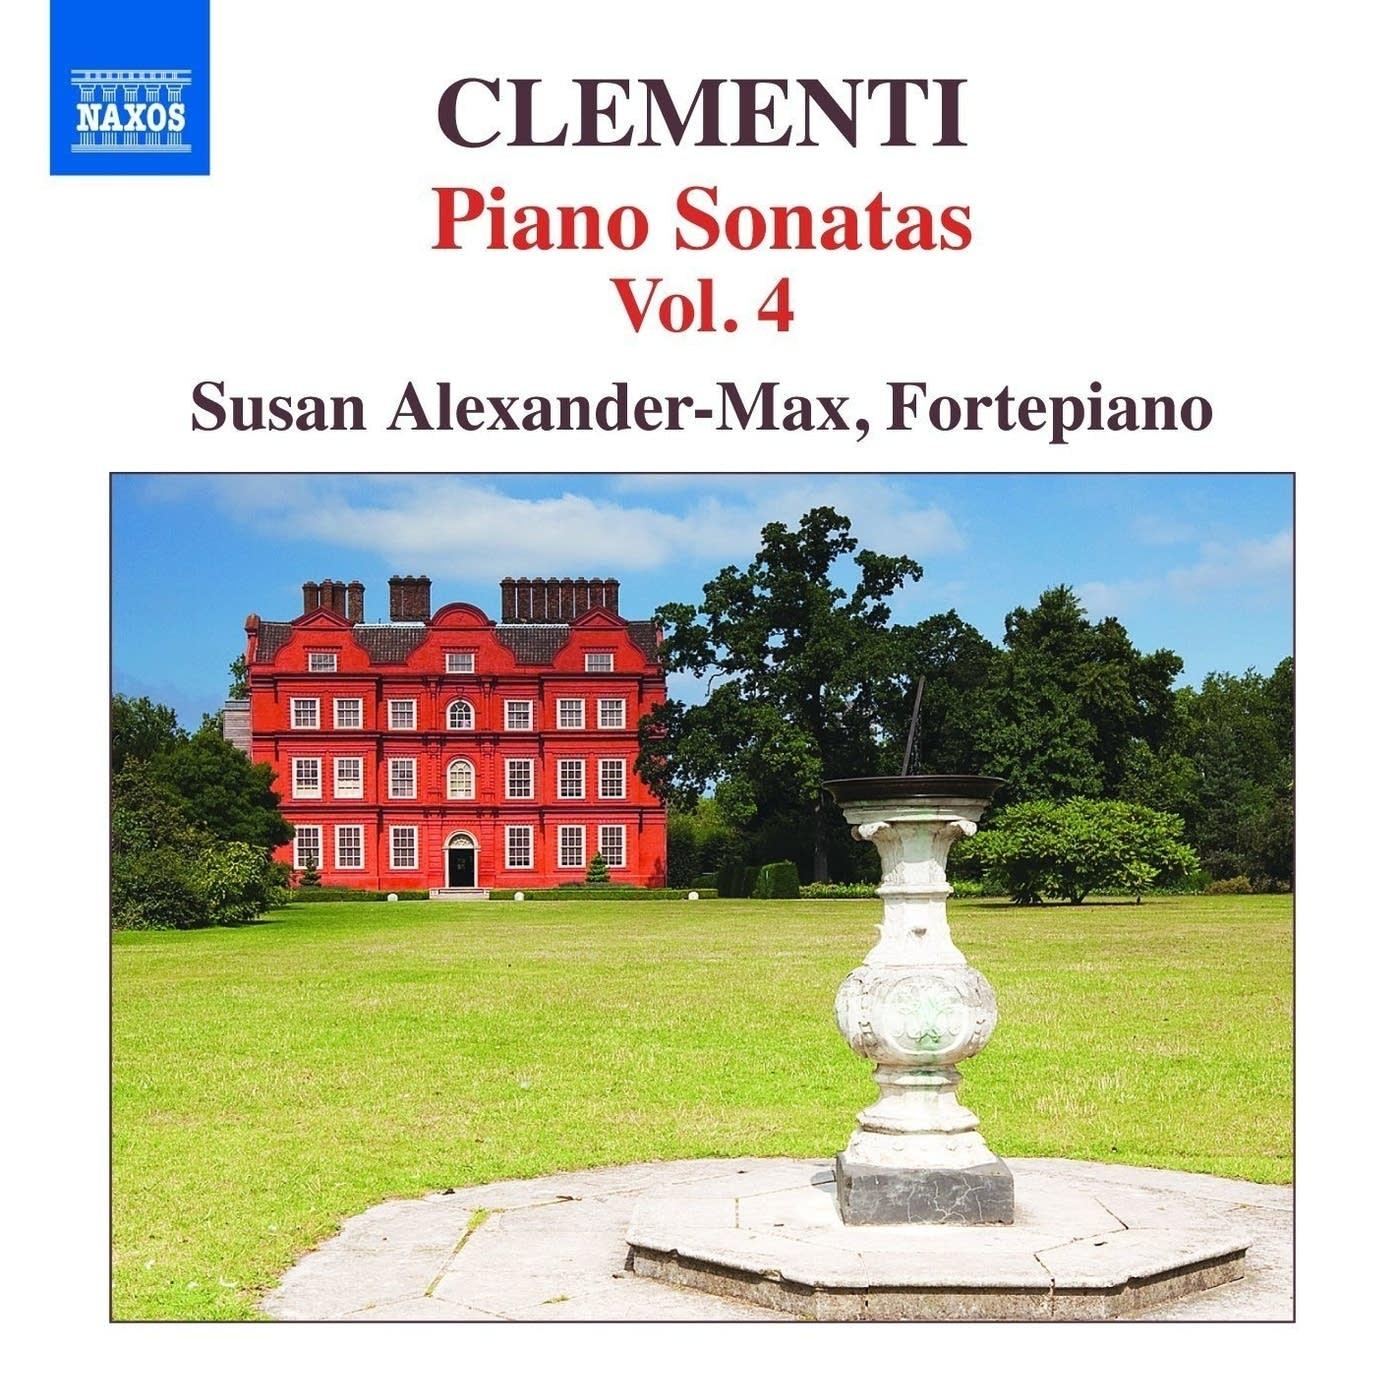 https://img.apmcdn.org/4b21a6e46d5053816758428c0c4e981ca8563691/square/68d3c1-20160703-muzio-clementi-keyboard-sonata-no-3.jpg